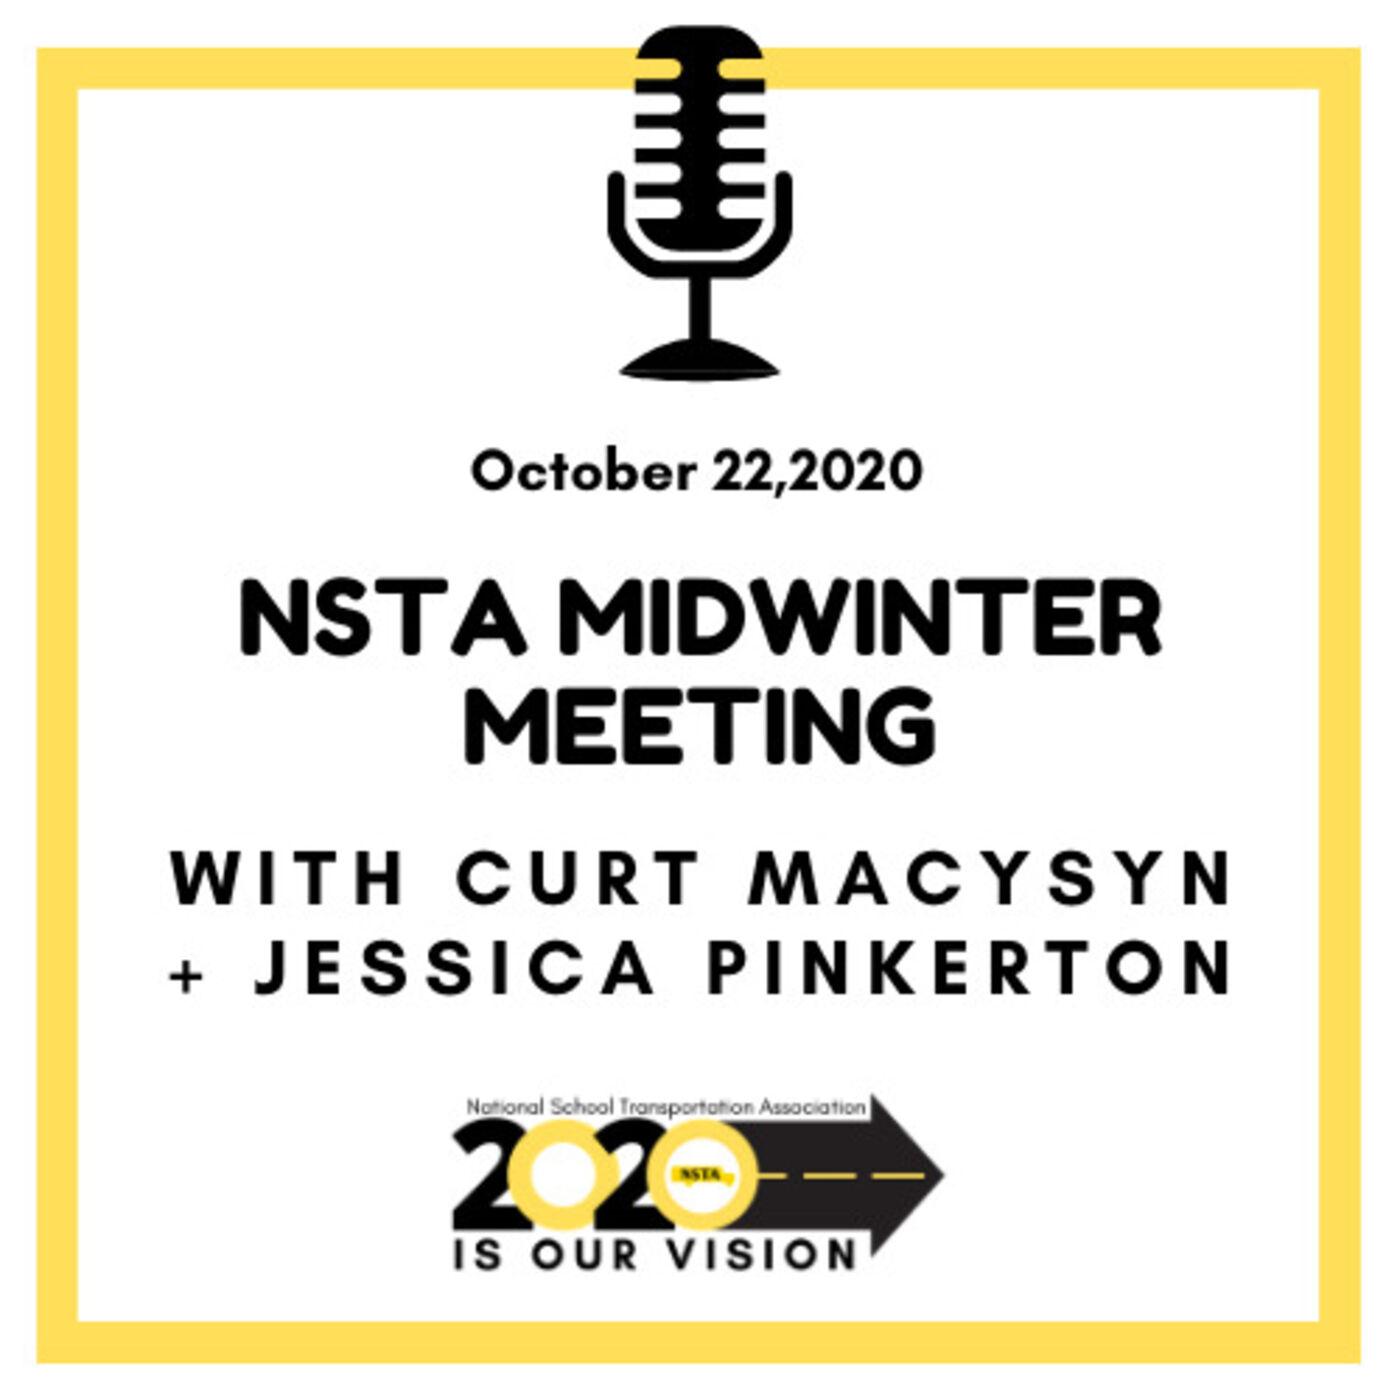 NSTA Mid Winter Meeting | Jessica Pinkerton, NSTA Member Services Coordinator